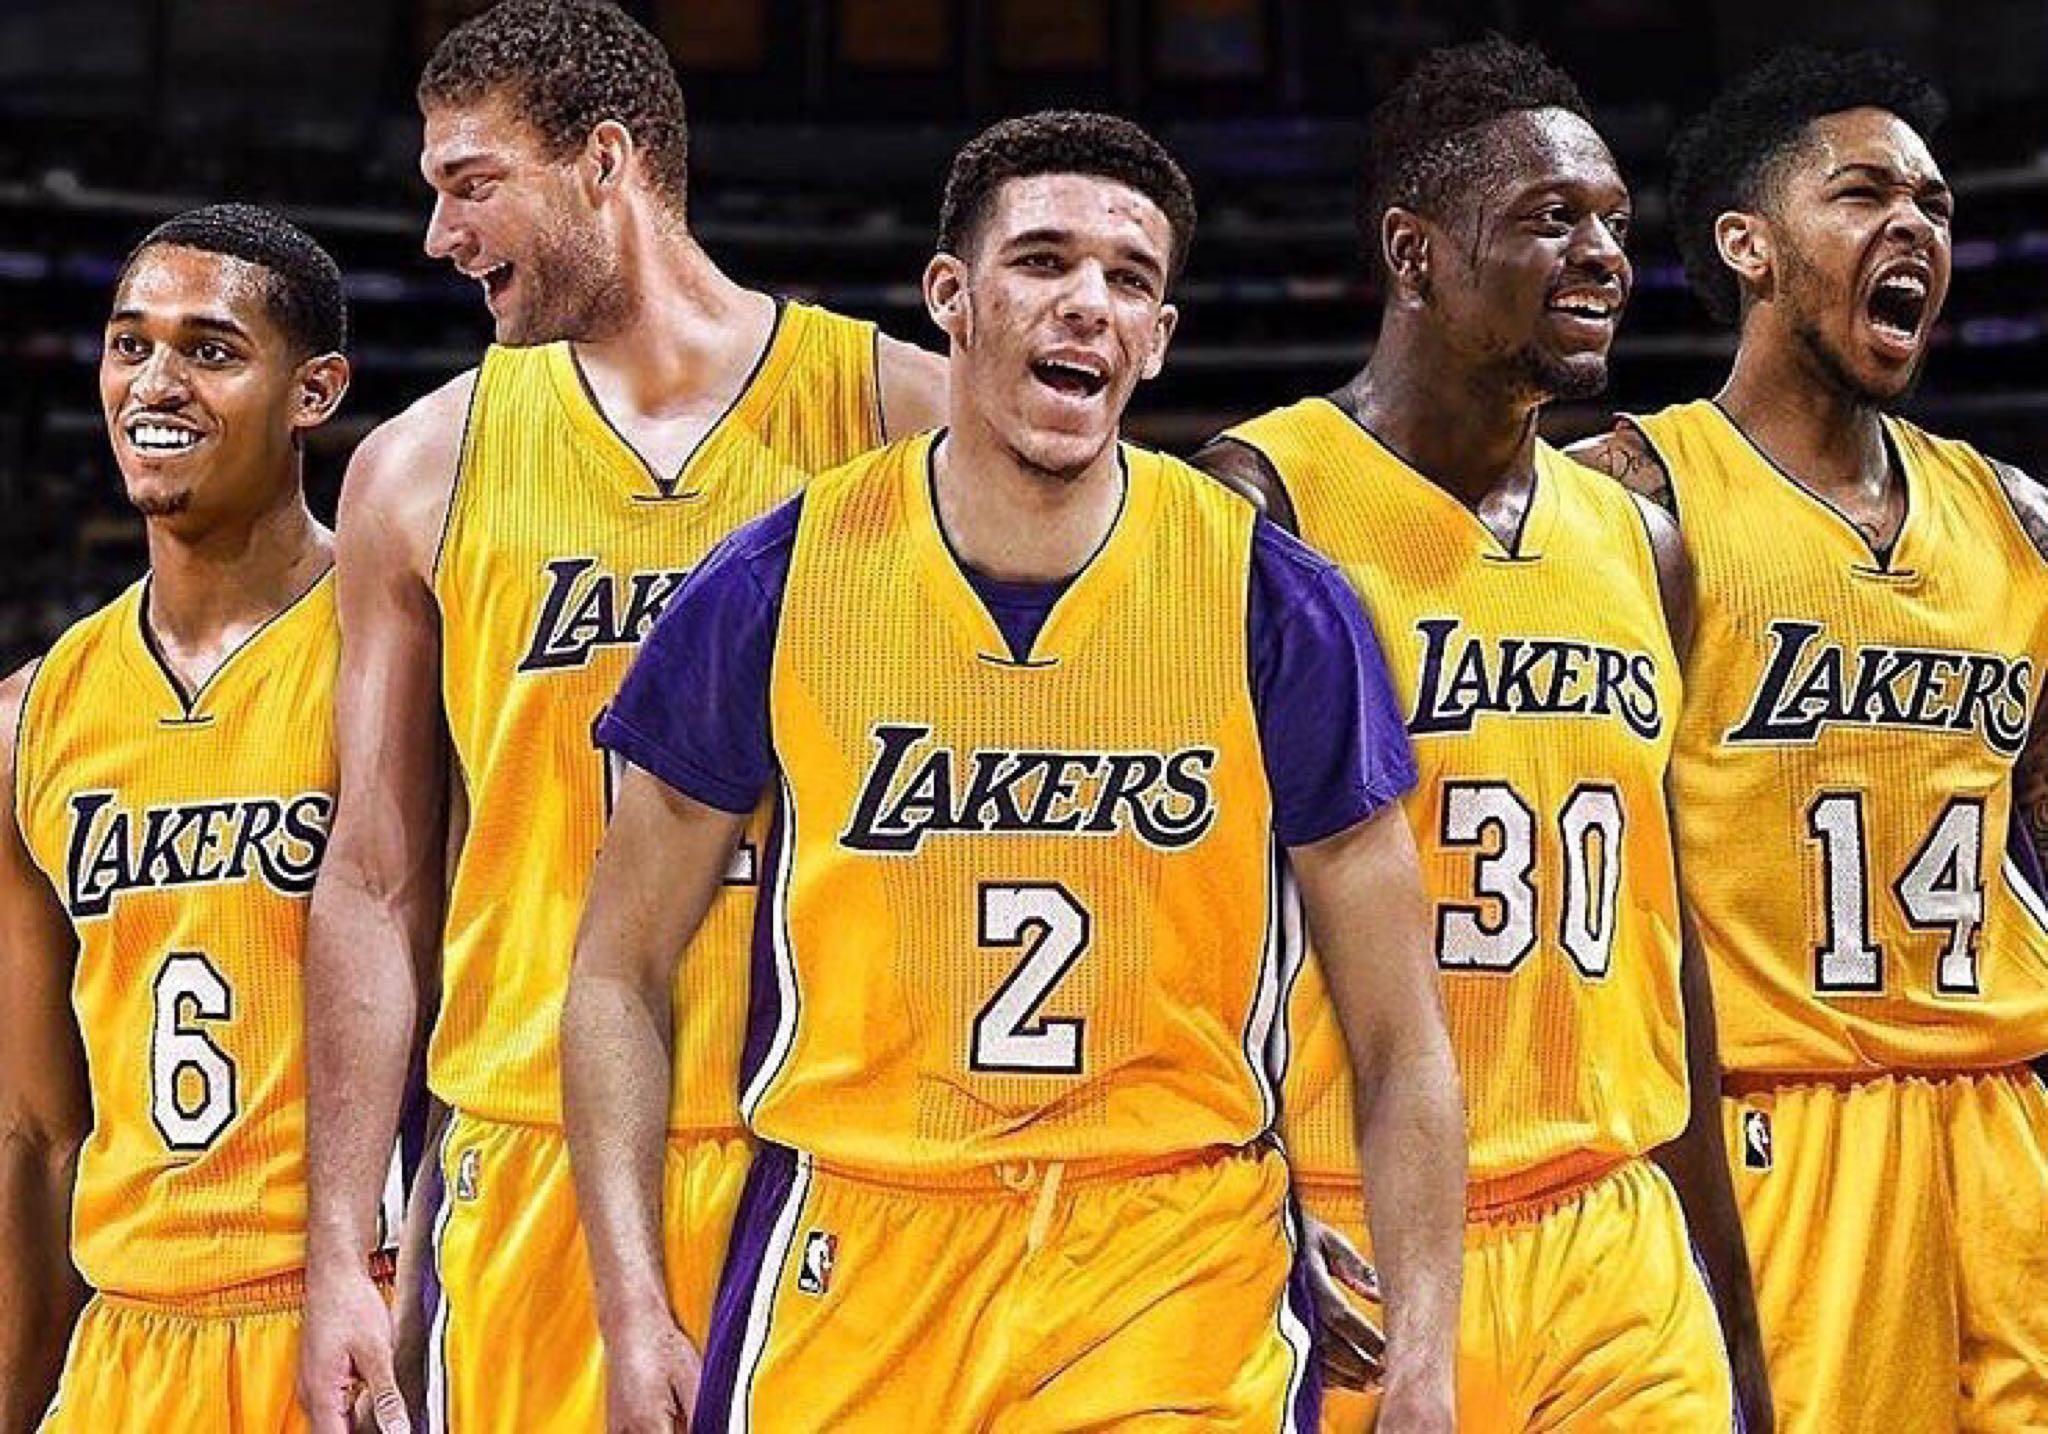 Lakers Team Wallpapers - Wallpaper Cave